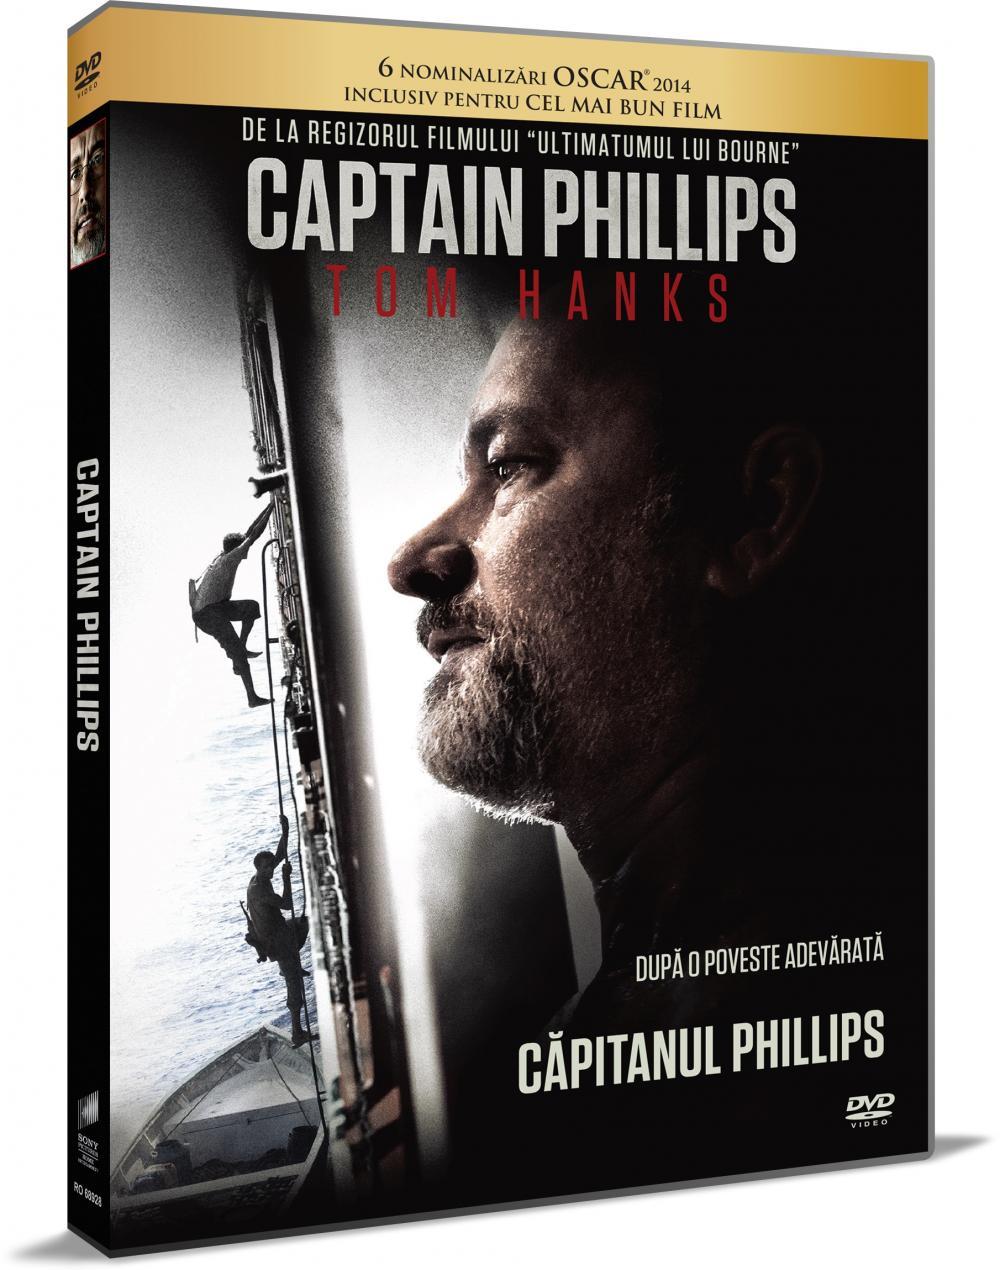 CAPTAIN PHILLIPS - CAPITANUL PHILLIPS